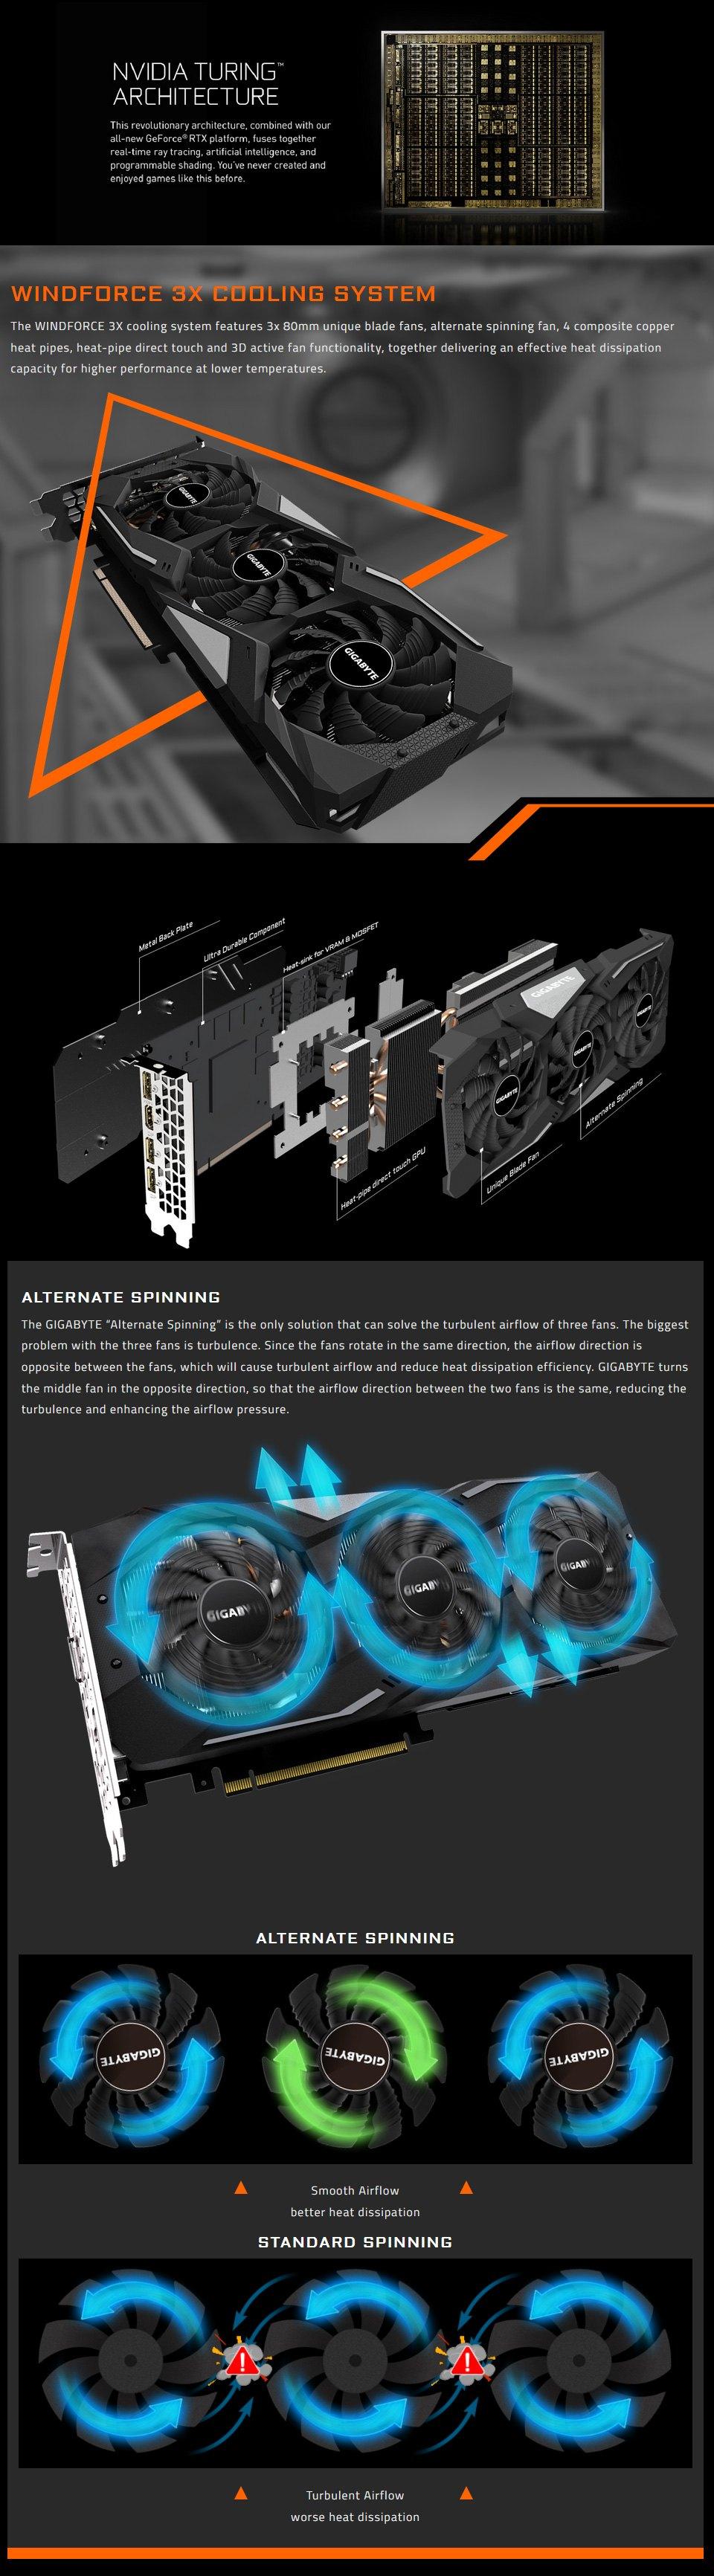 Gigabyte GeForce RTX 2060 Super Gaming OC 3X 8GB features